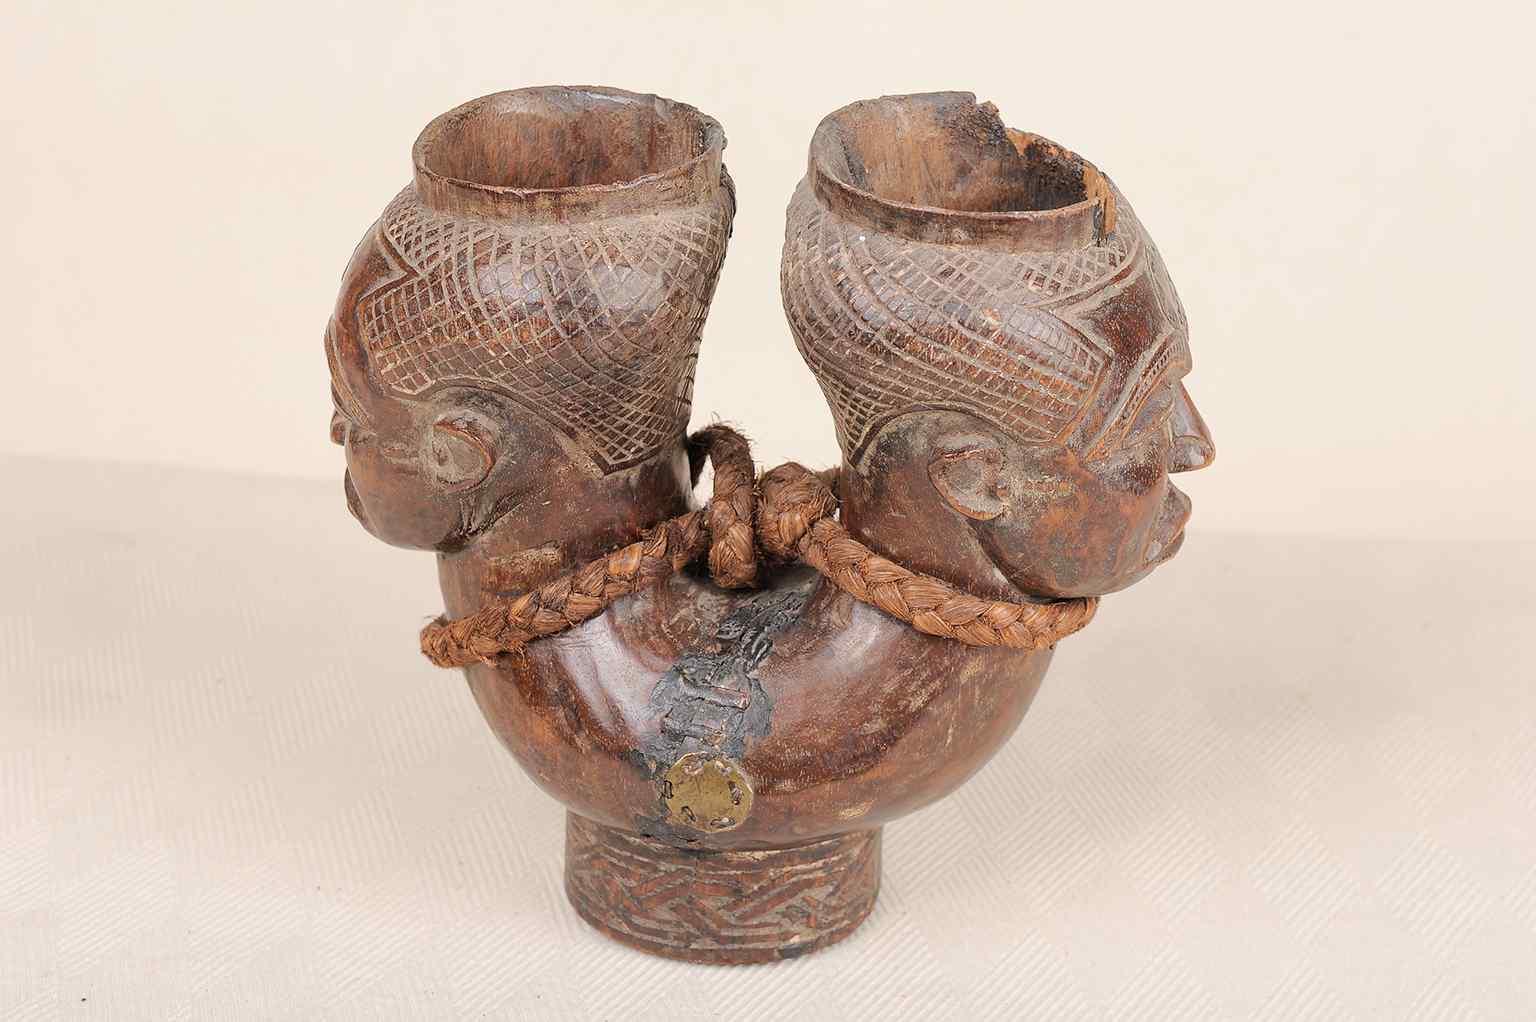 Ancient queen's bowl